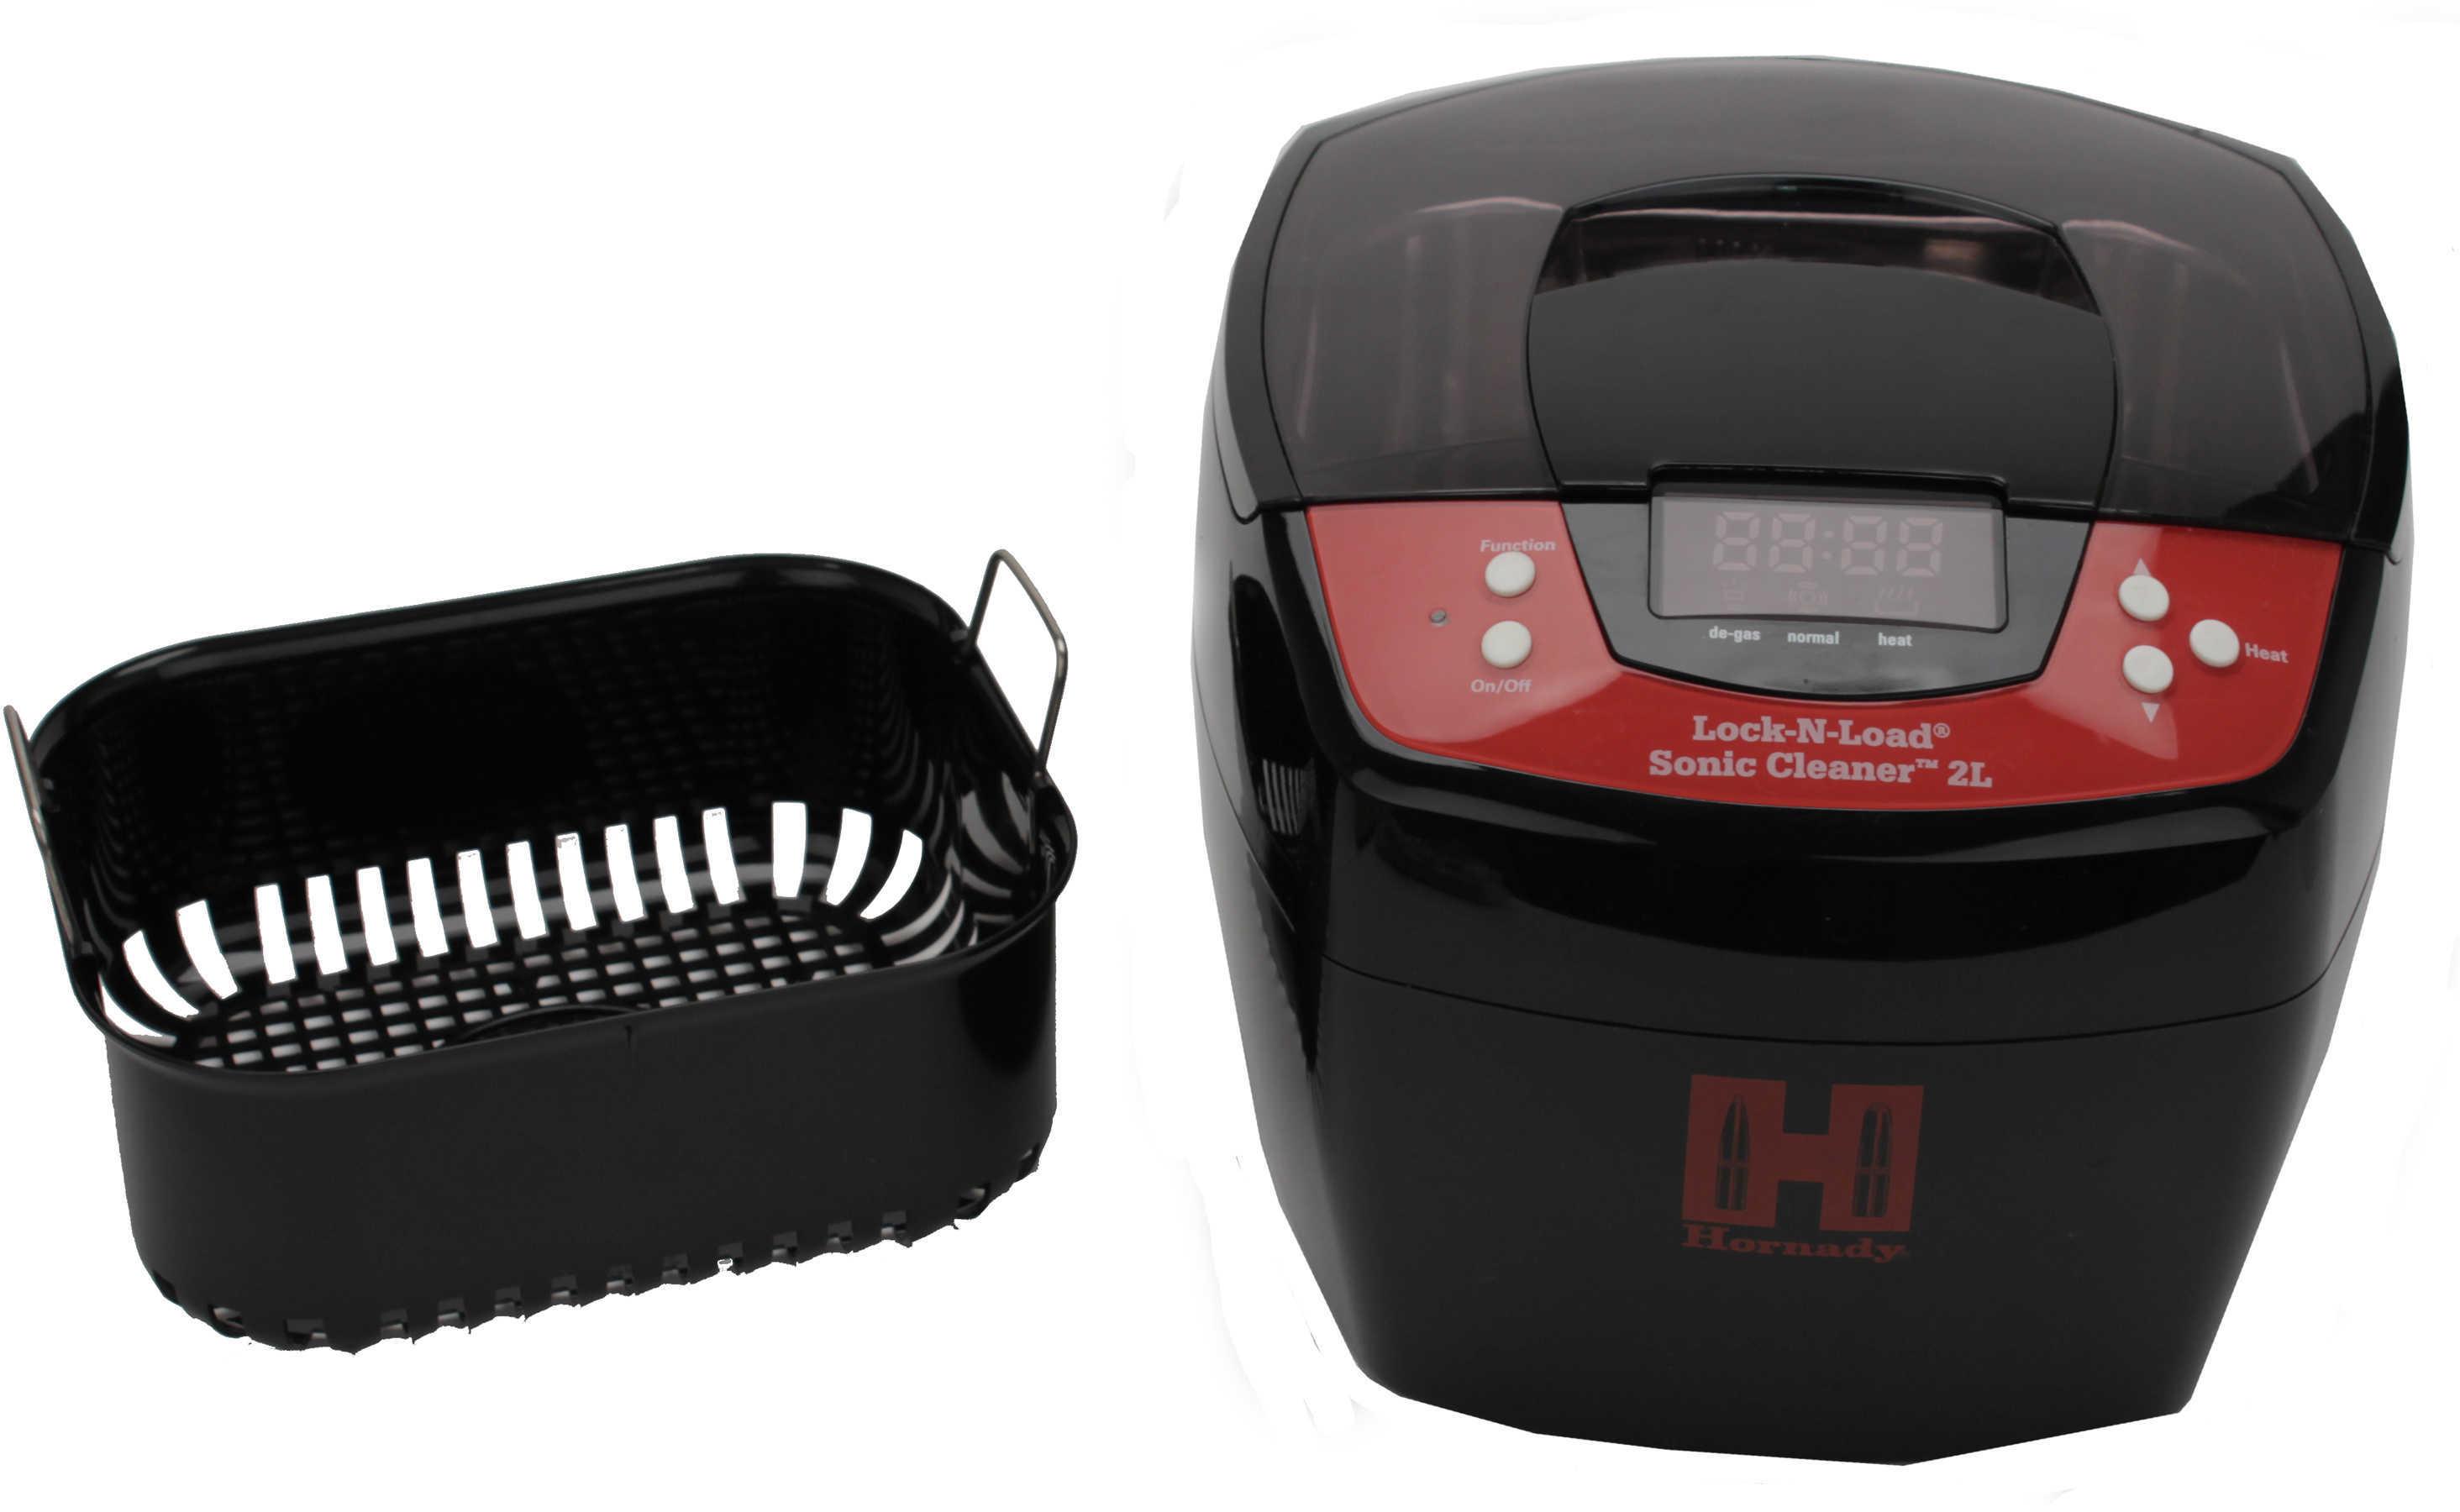 Hornady Lock N Load Sonic Cleaner LiH 2 Liter Heated 110 Volt Md: 043320